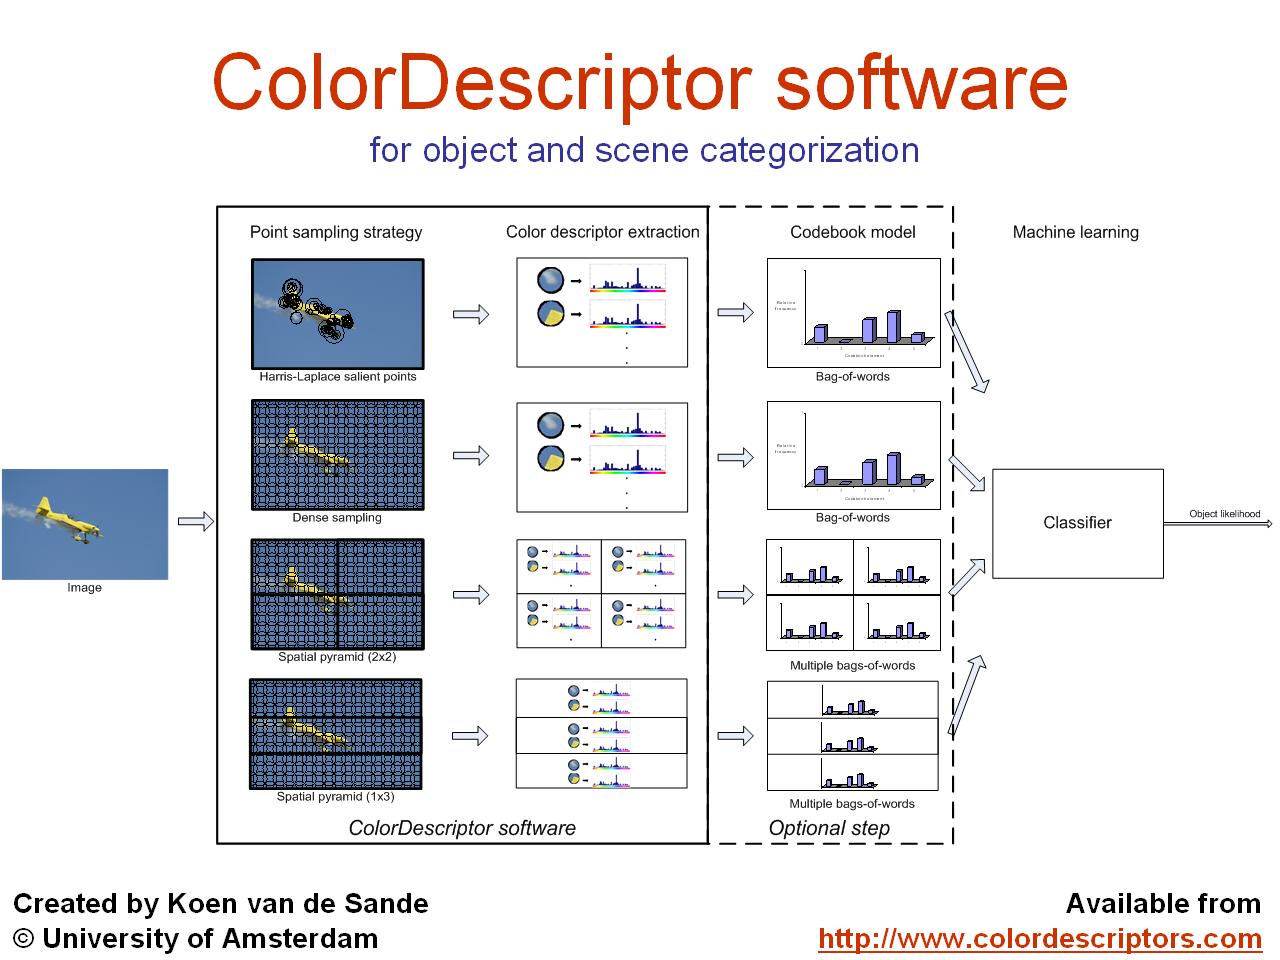 ColorDescriptor software overview